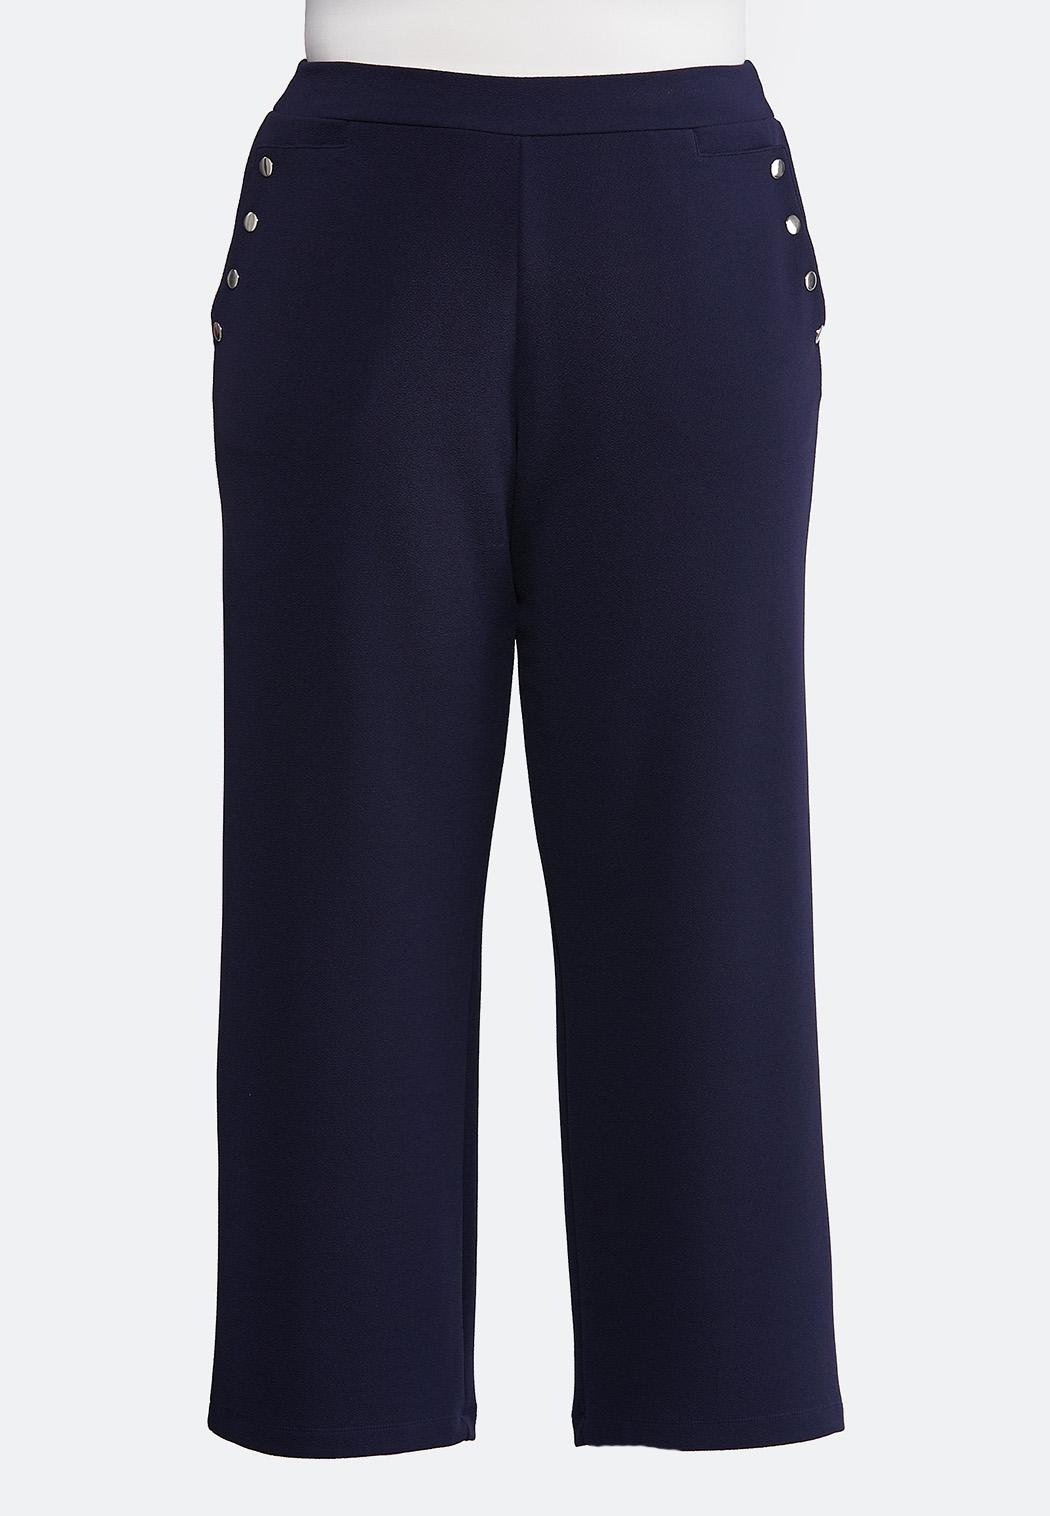 f500bbc9145 Plus Size Textured Sailor Pants Wide Leg Cato Fashions